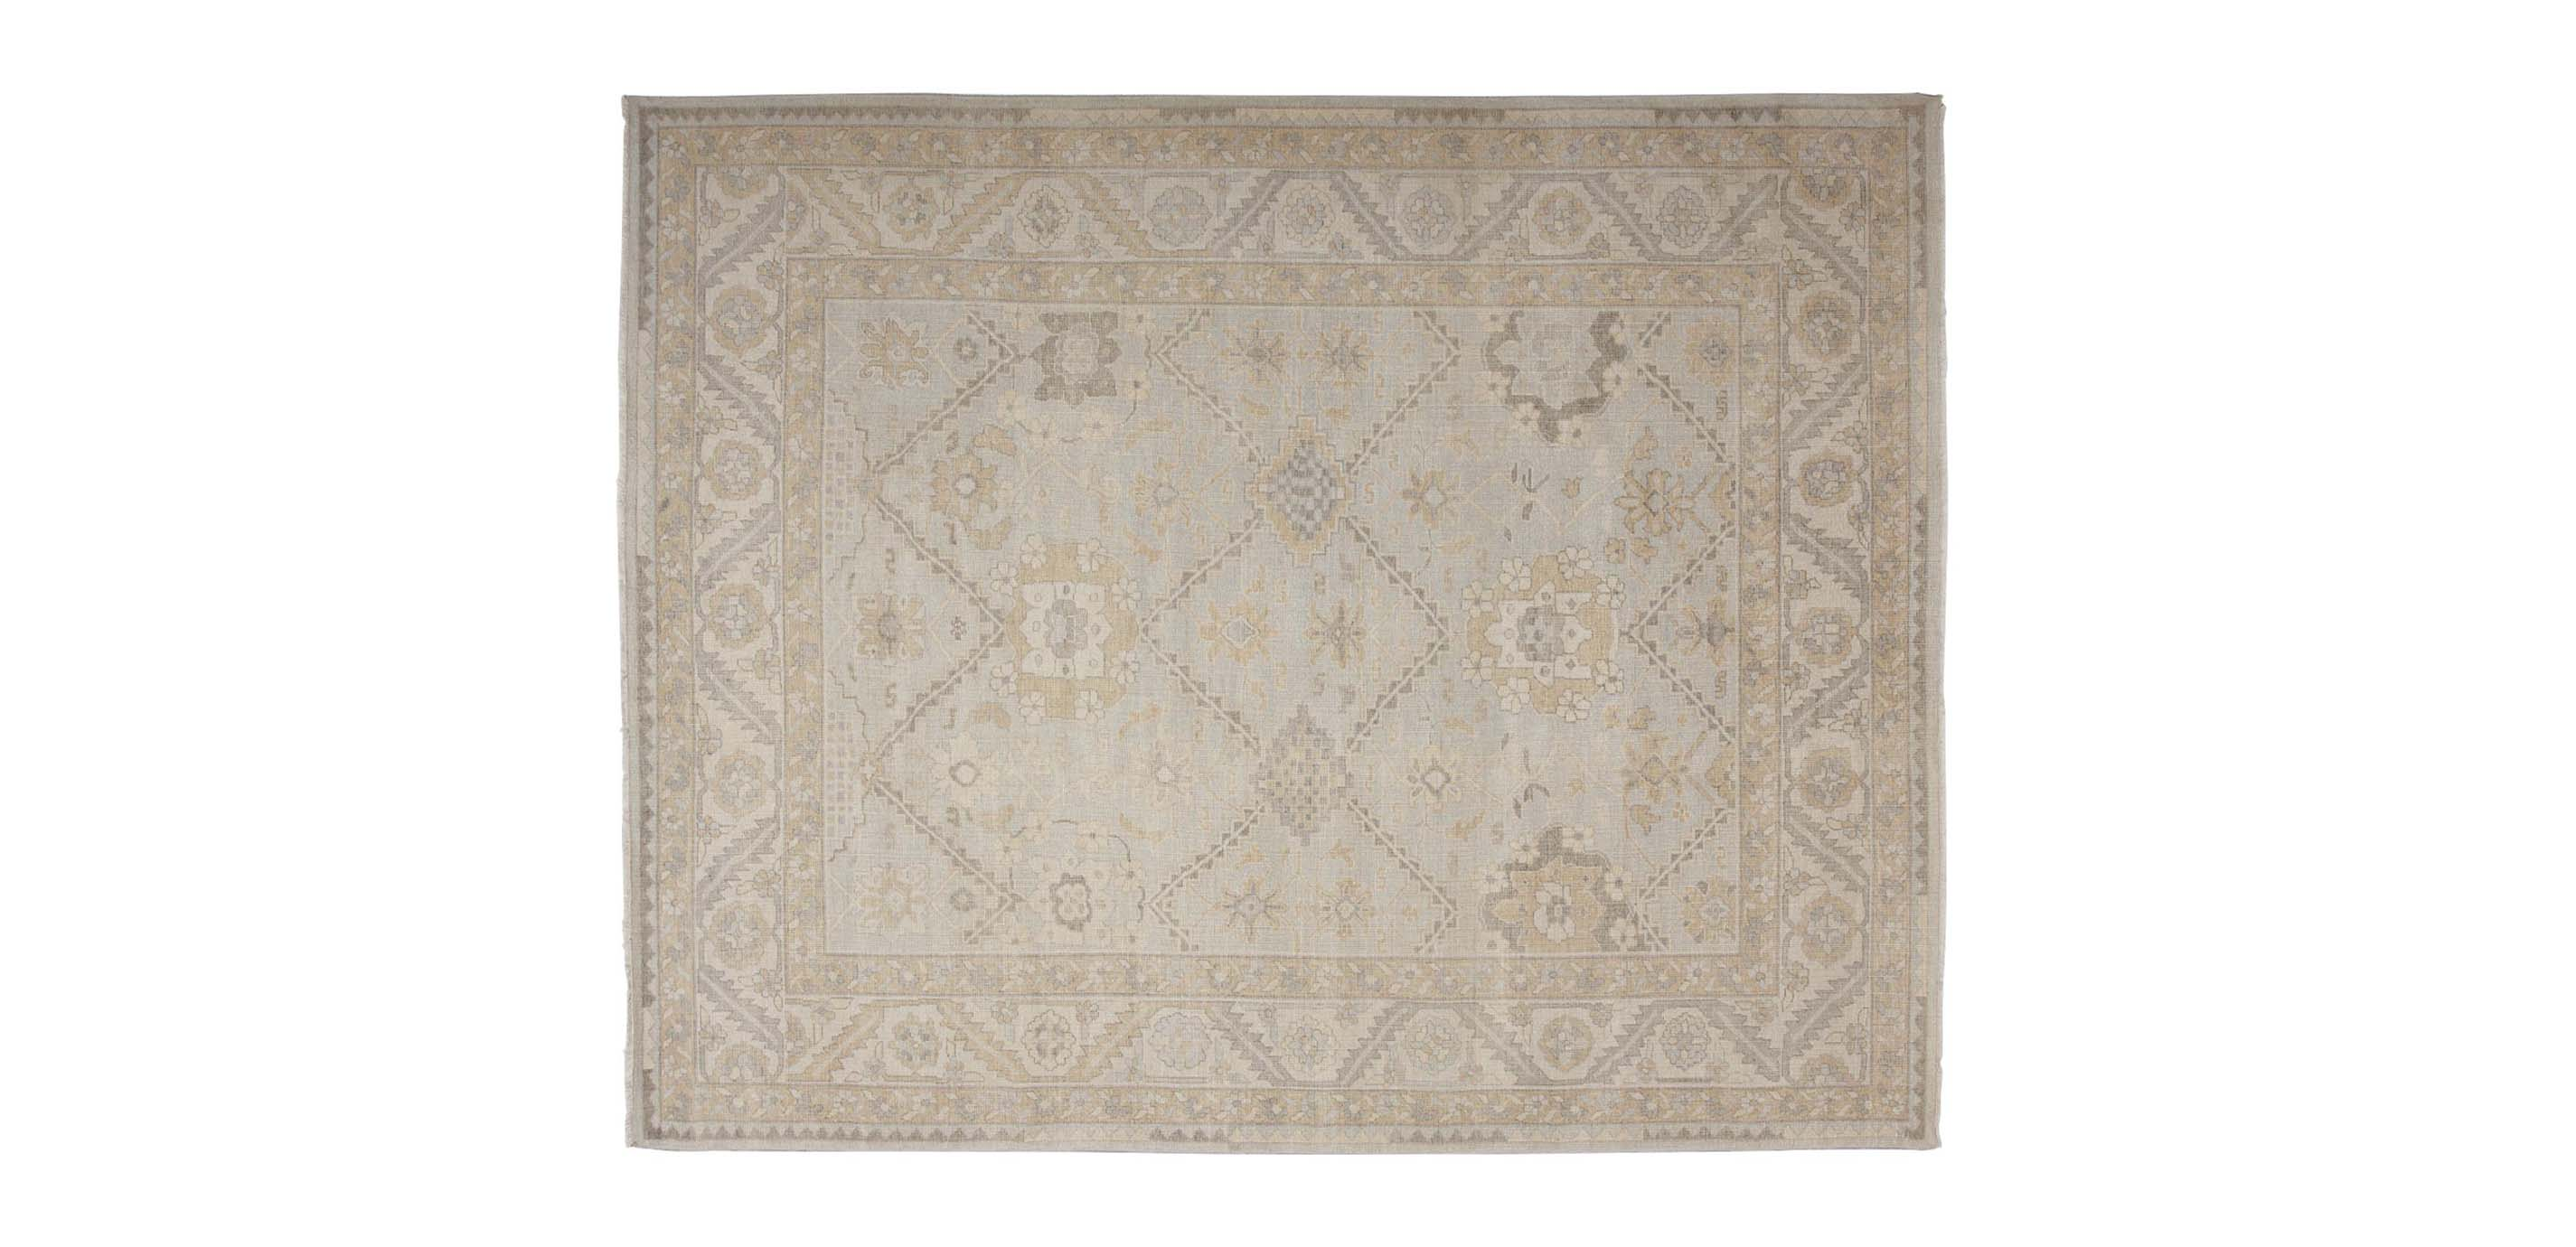 woven hand gray allium nicholls rug pdx wool rugs one way wayfair reviews area